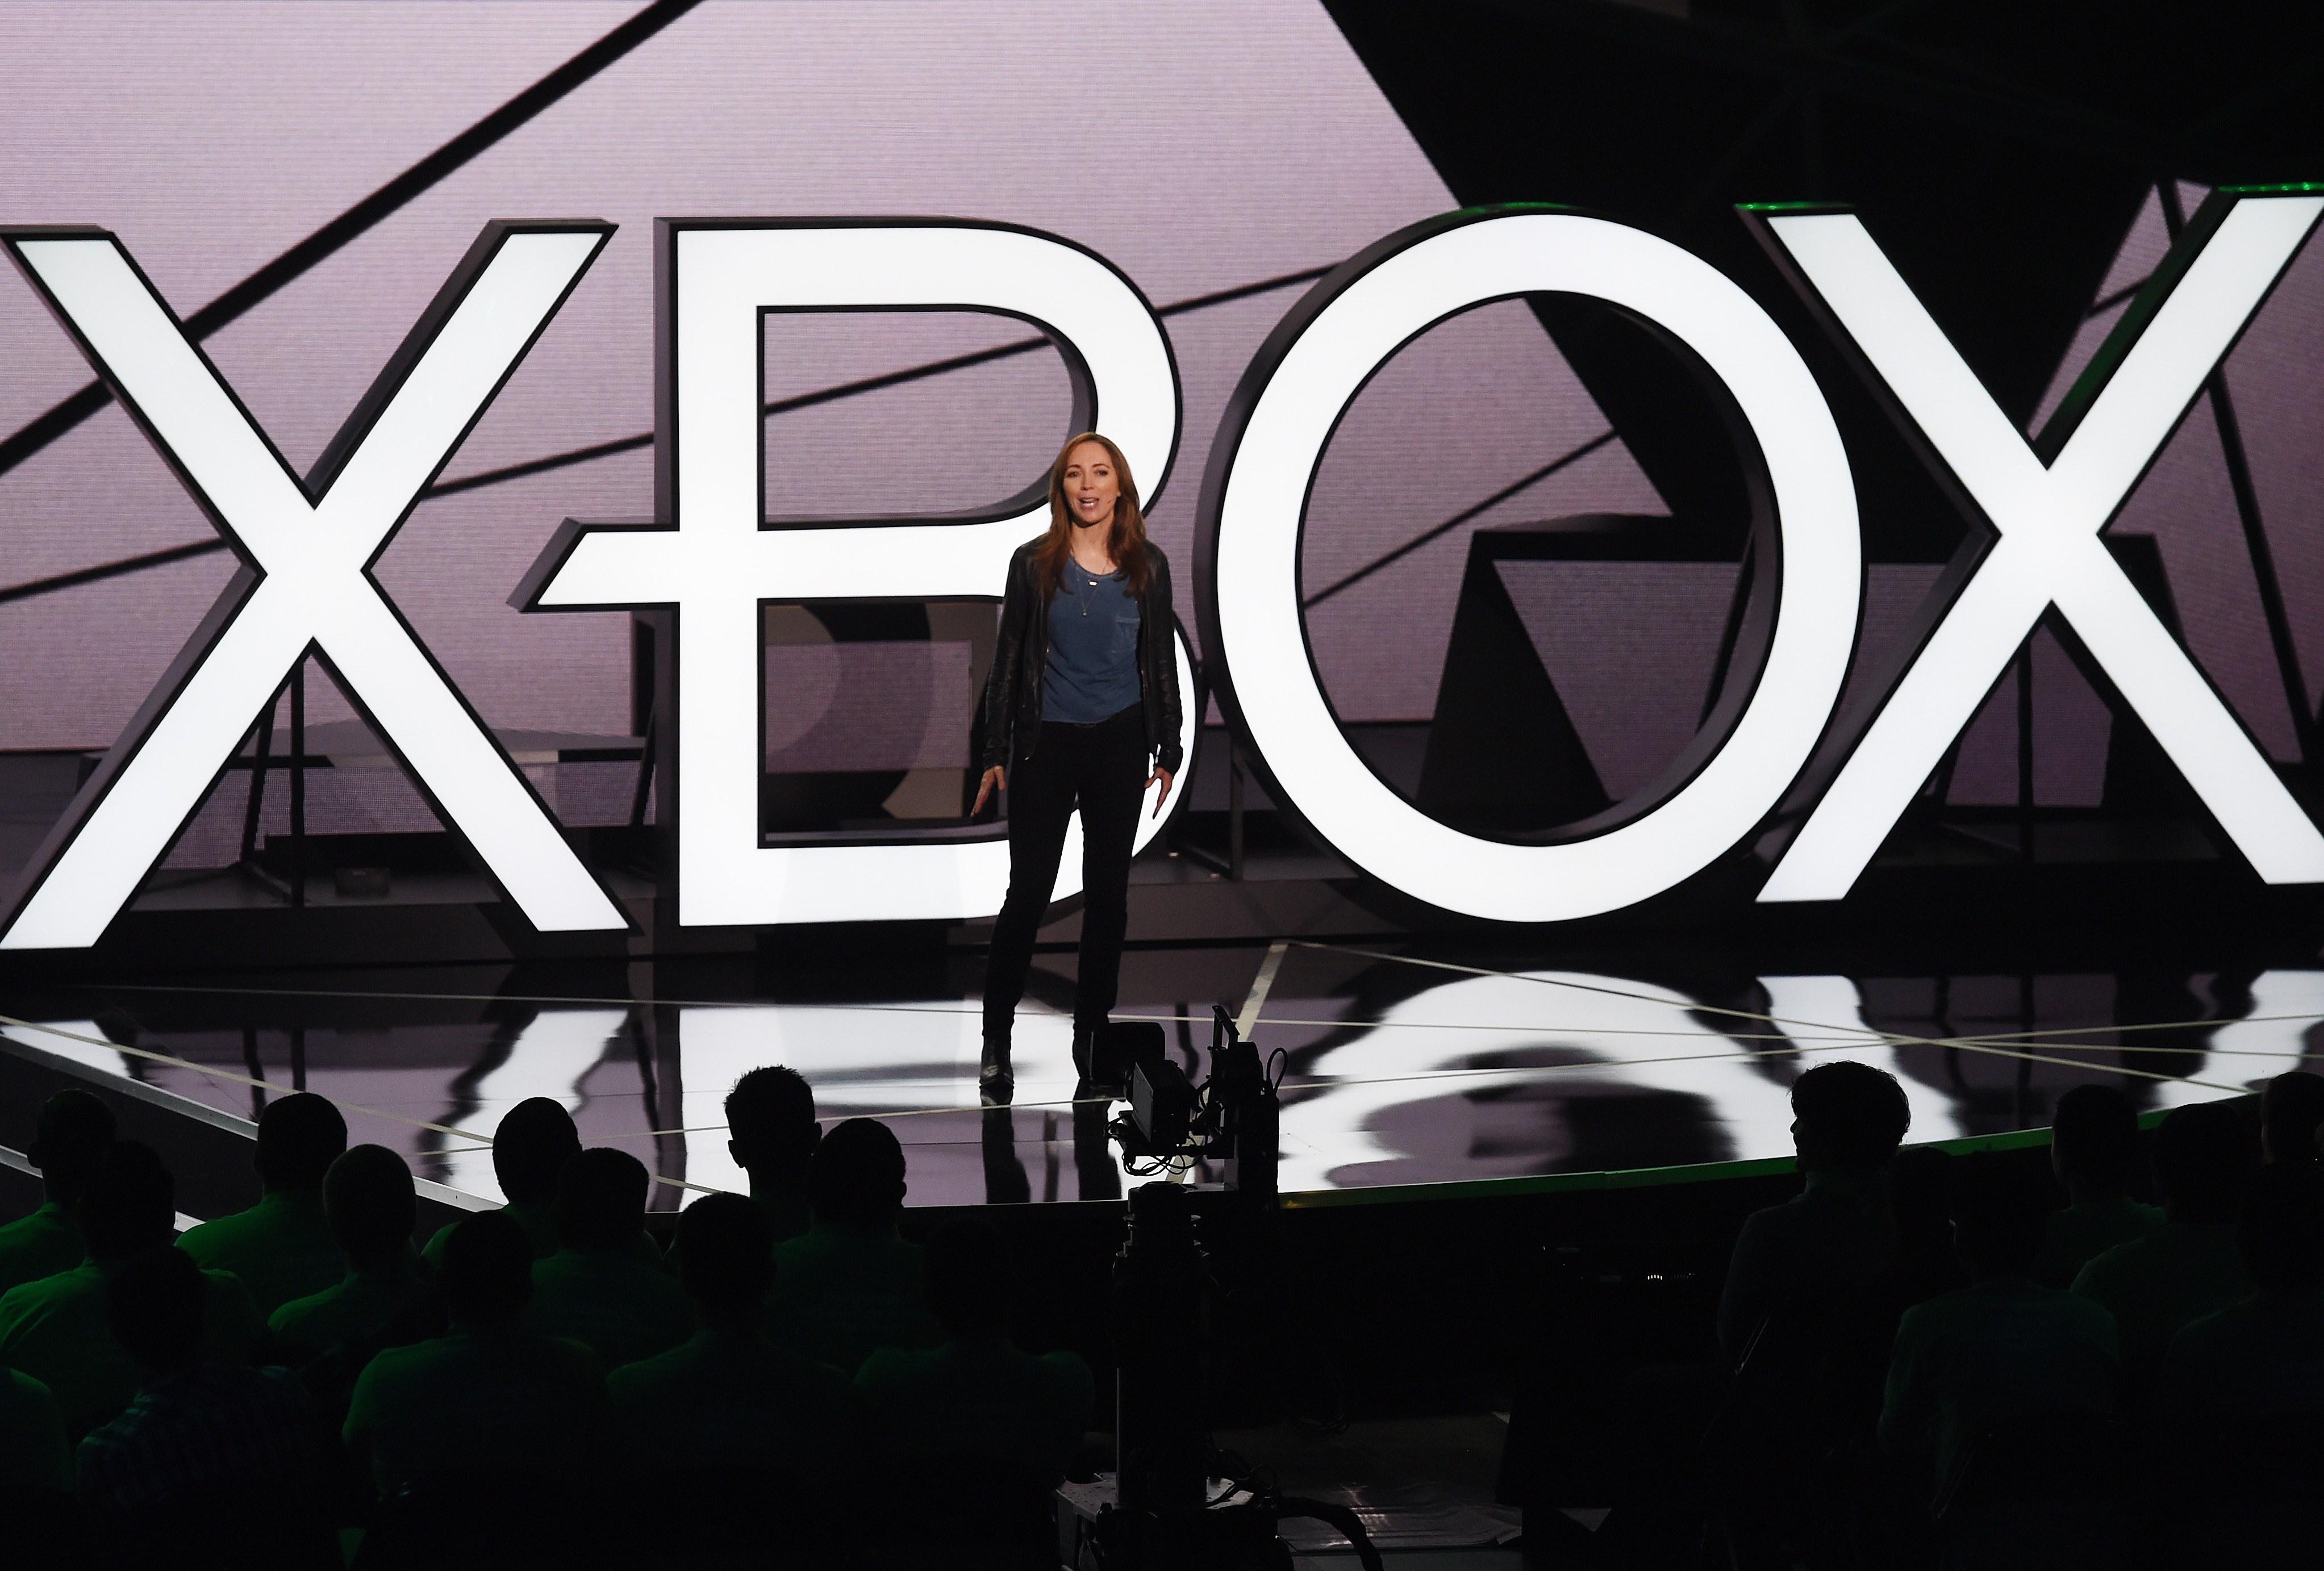 US-INTERNET-GAMES-XBOX-E3